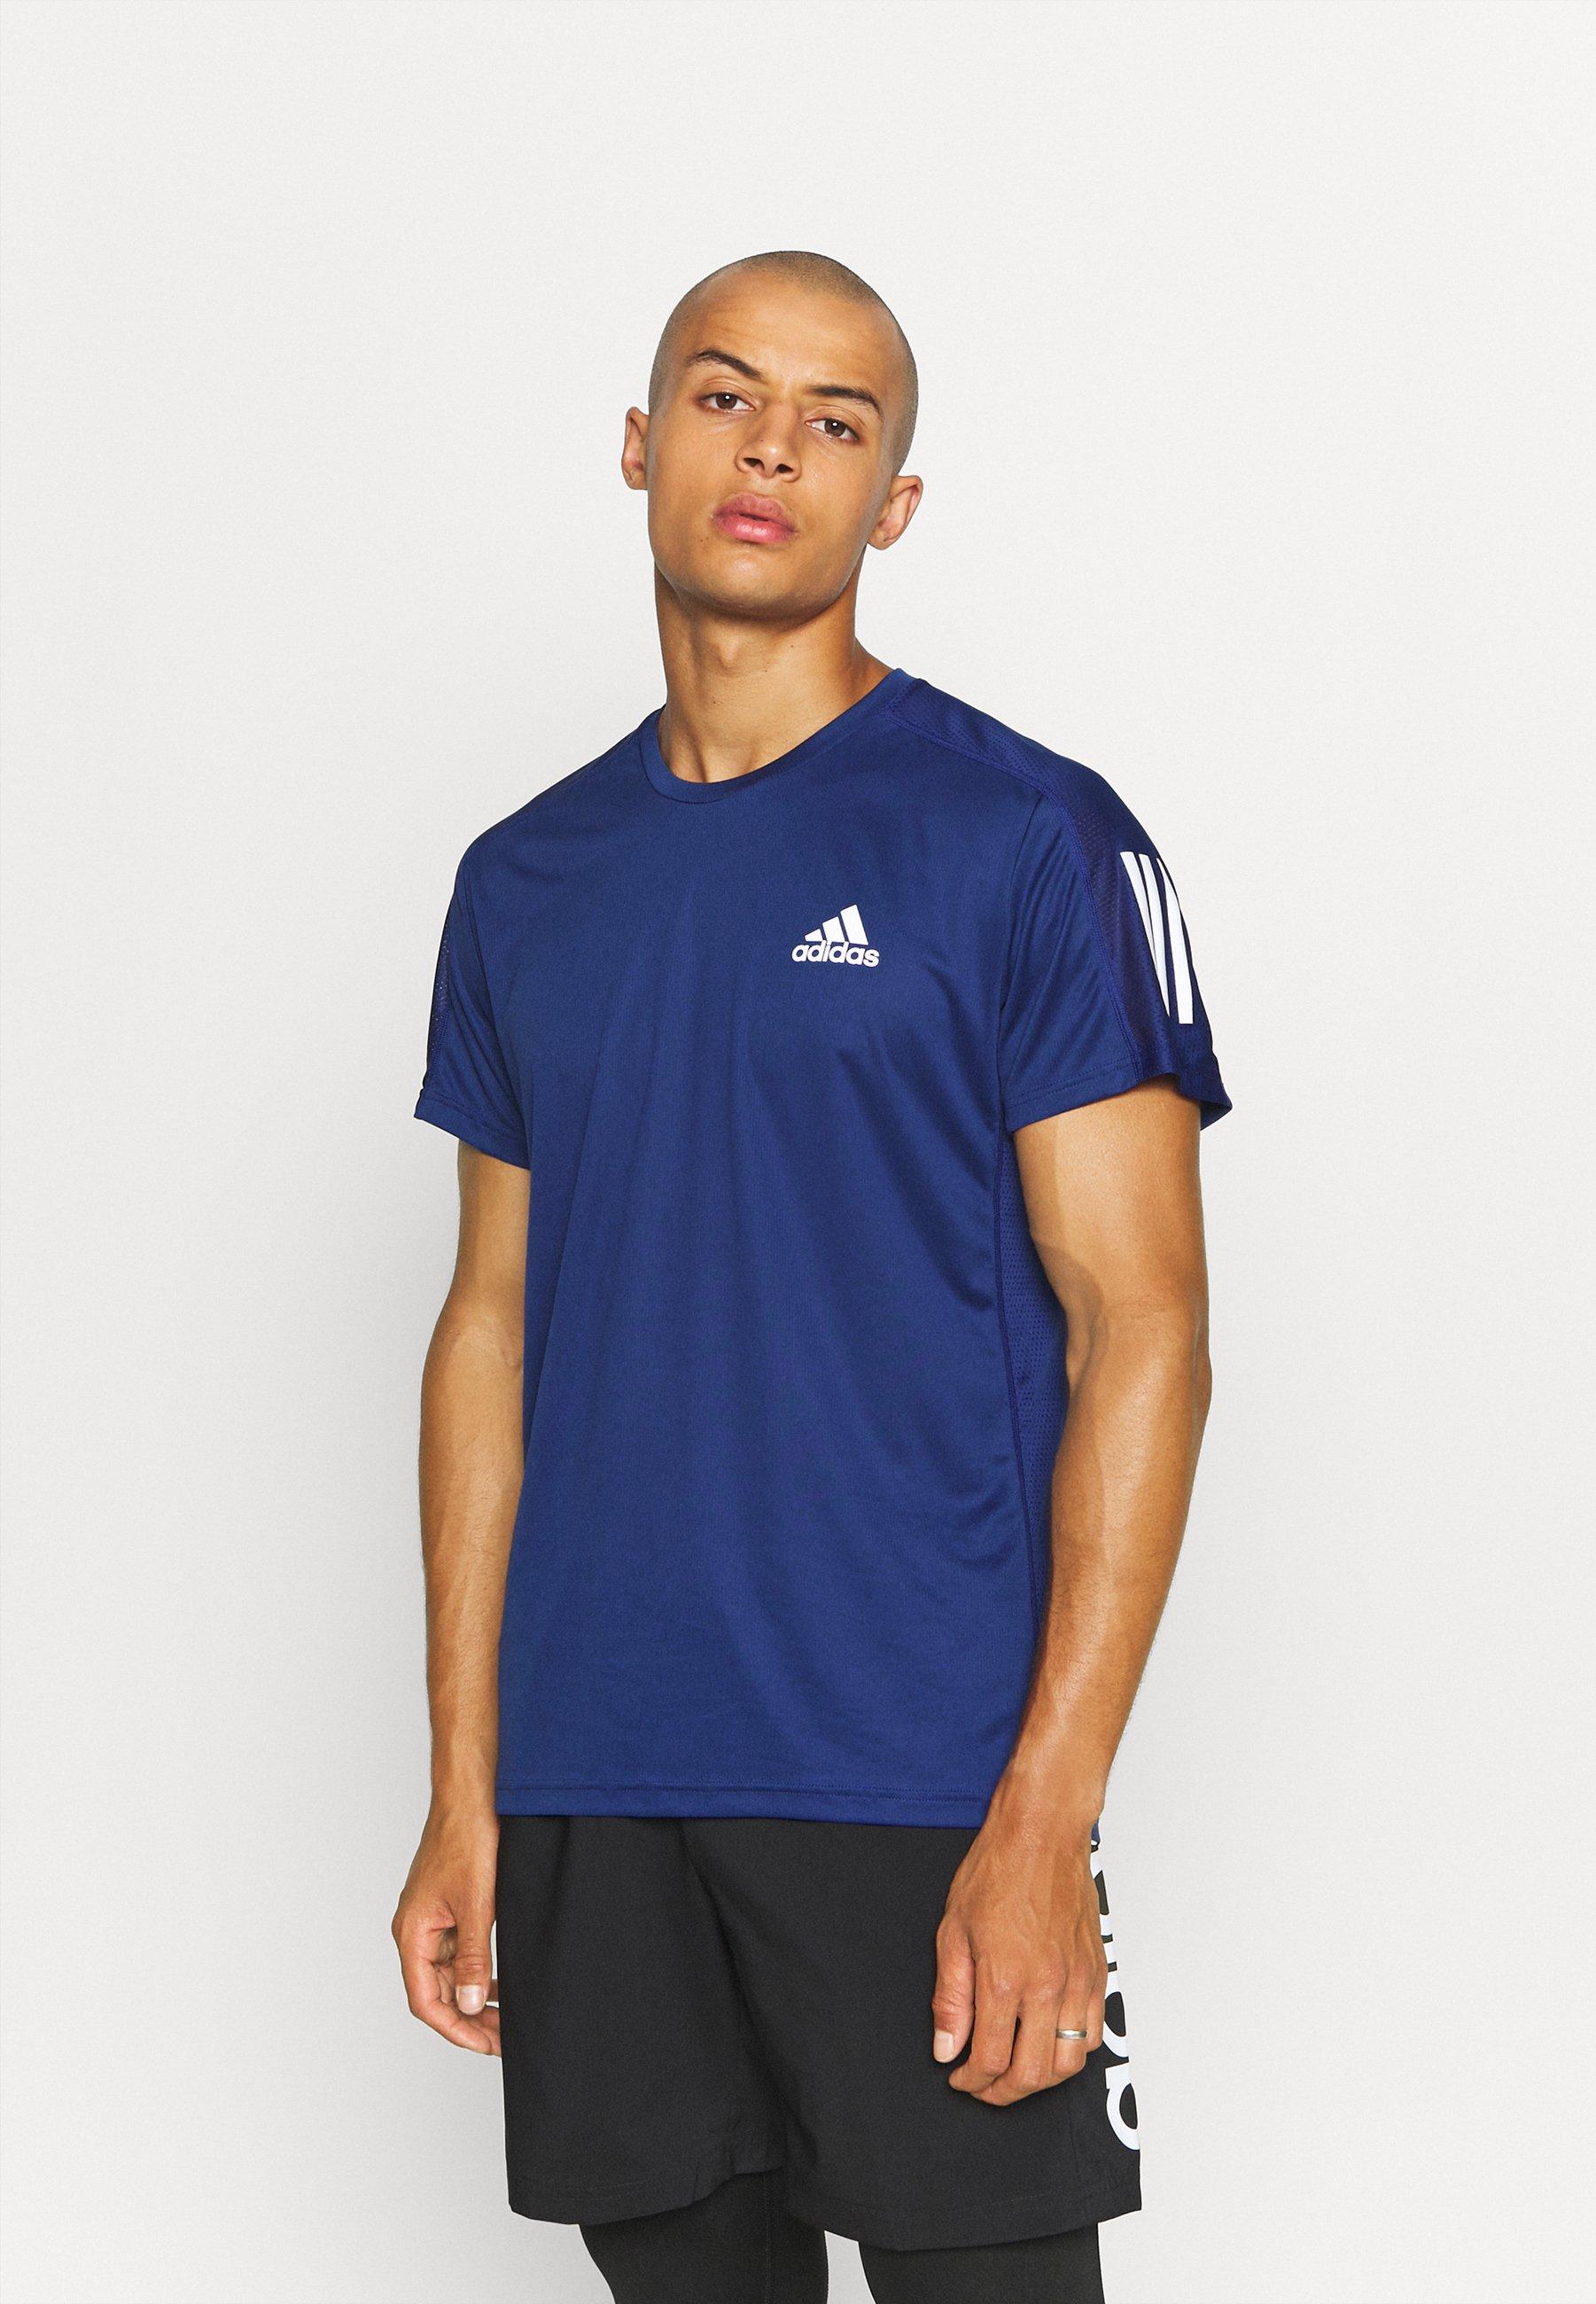 Uomo OWN THE RUNNING RESPONSE AEROREADY PRIMEGREEN T-SHIRT - T-shirt con stampa